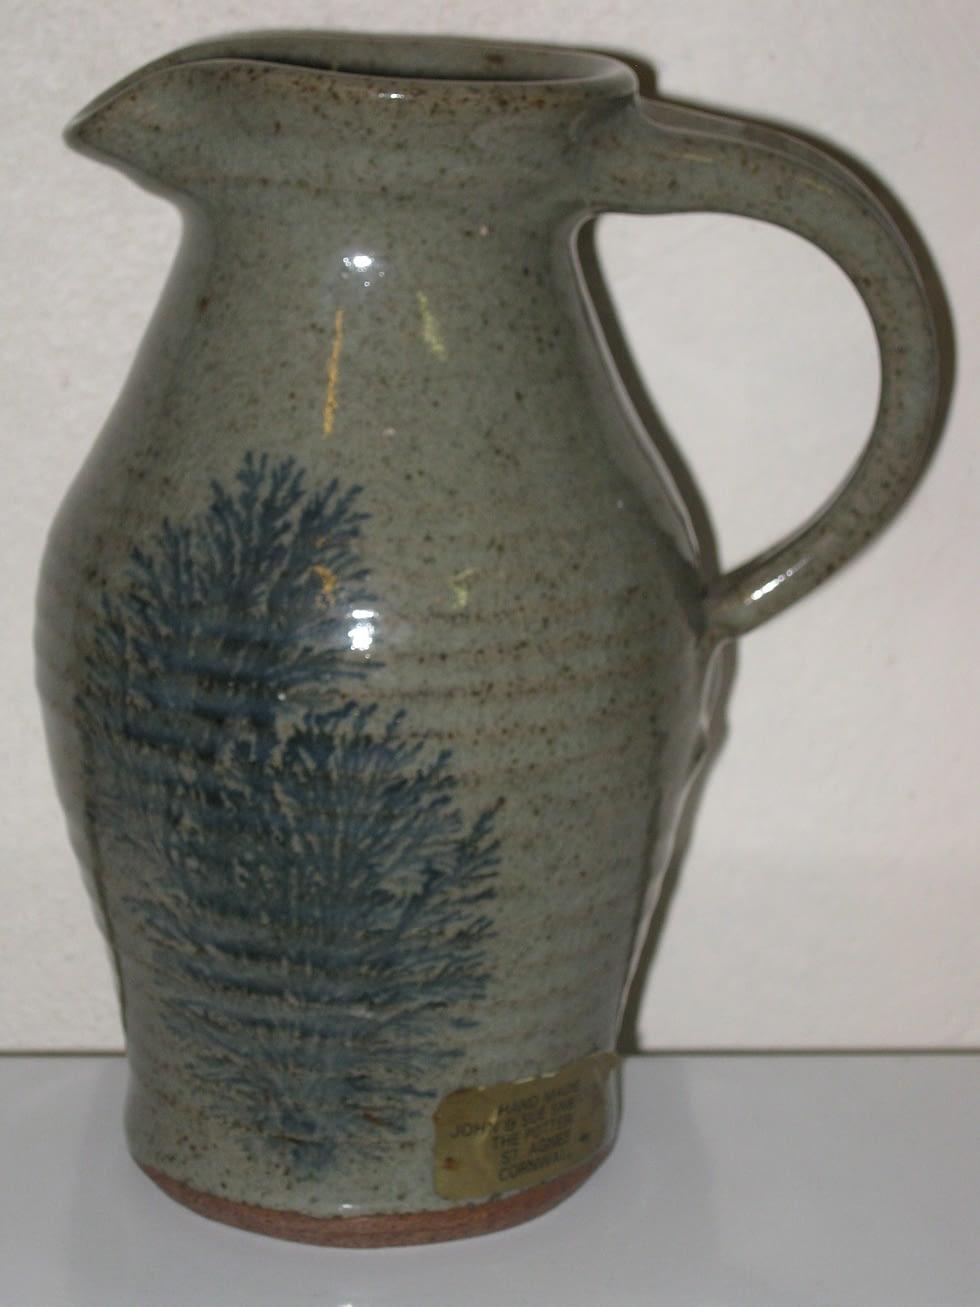 Tobacco spit jug by John and Sue Sneddon